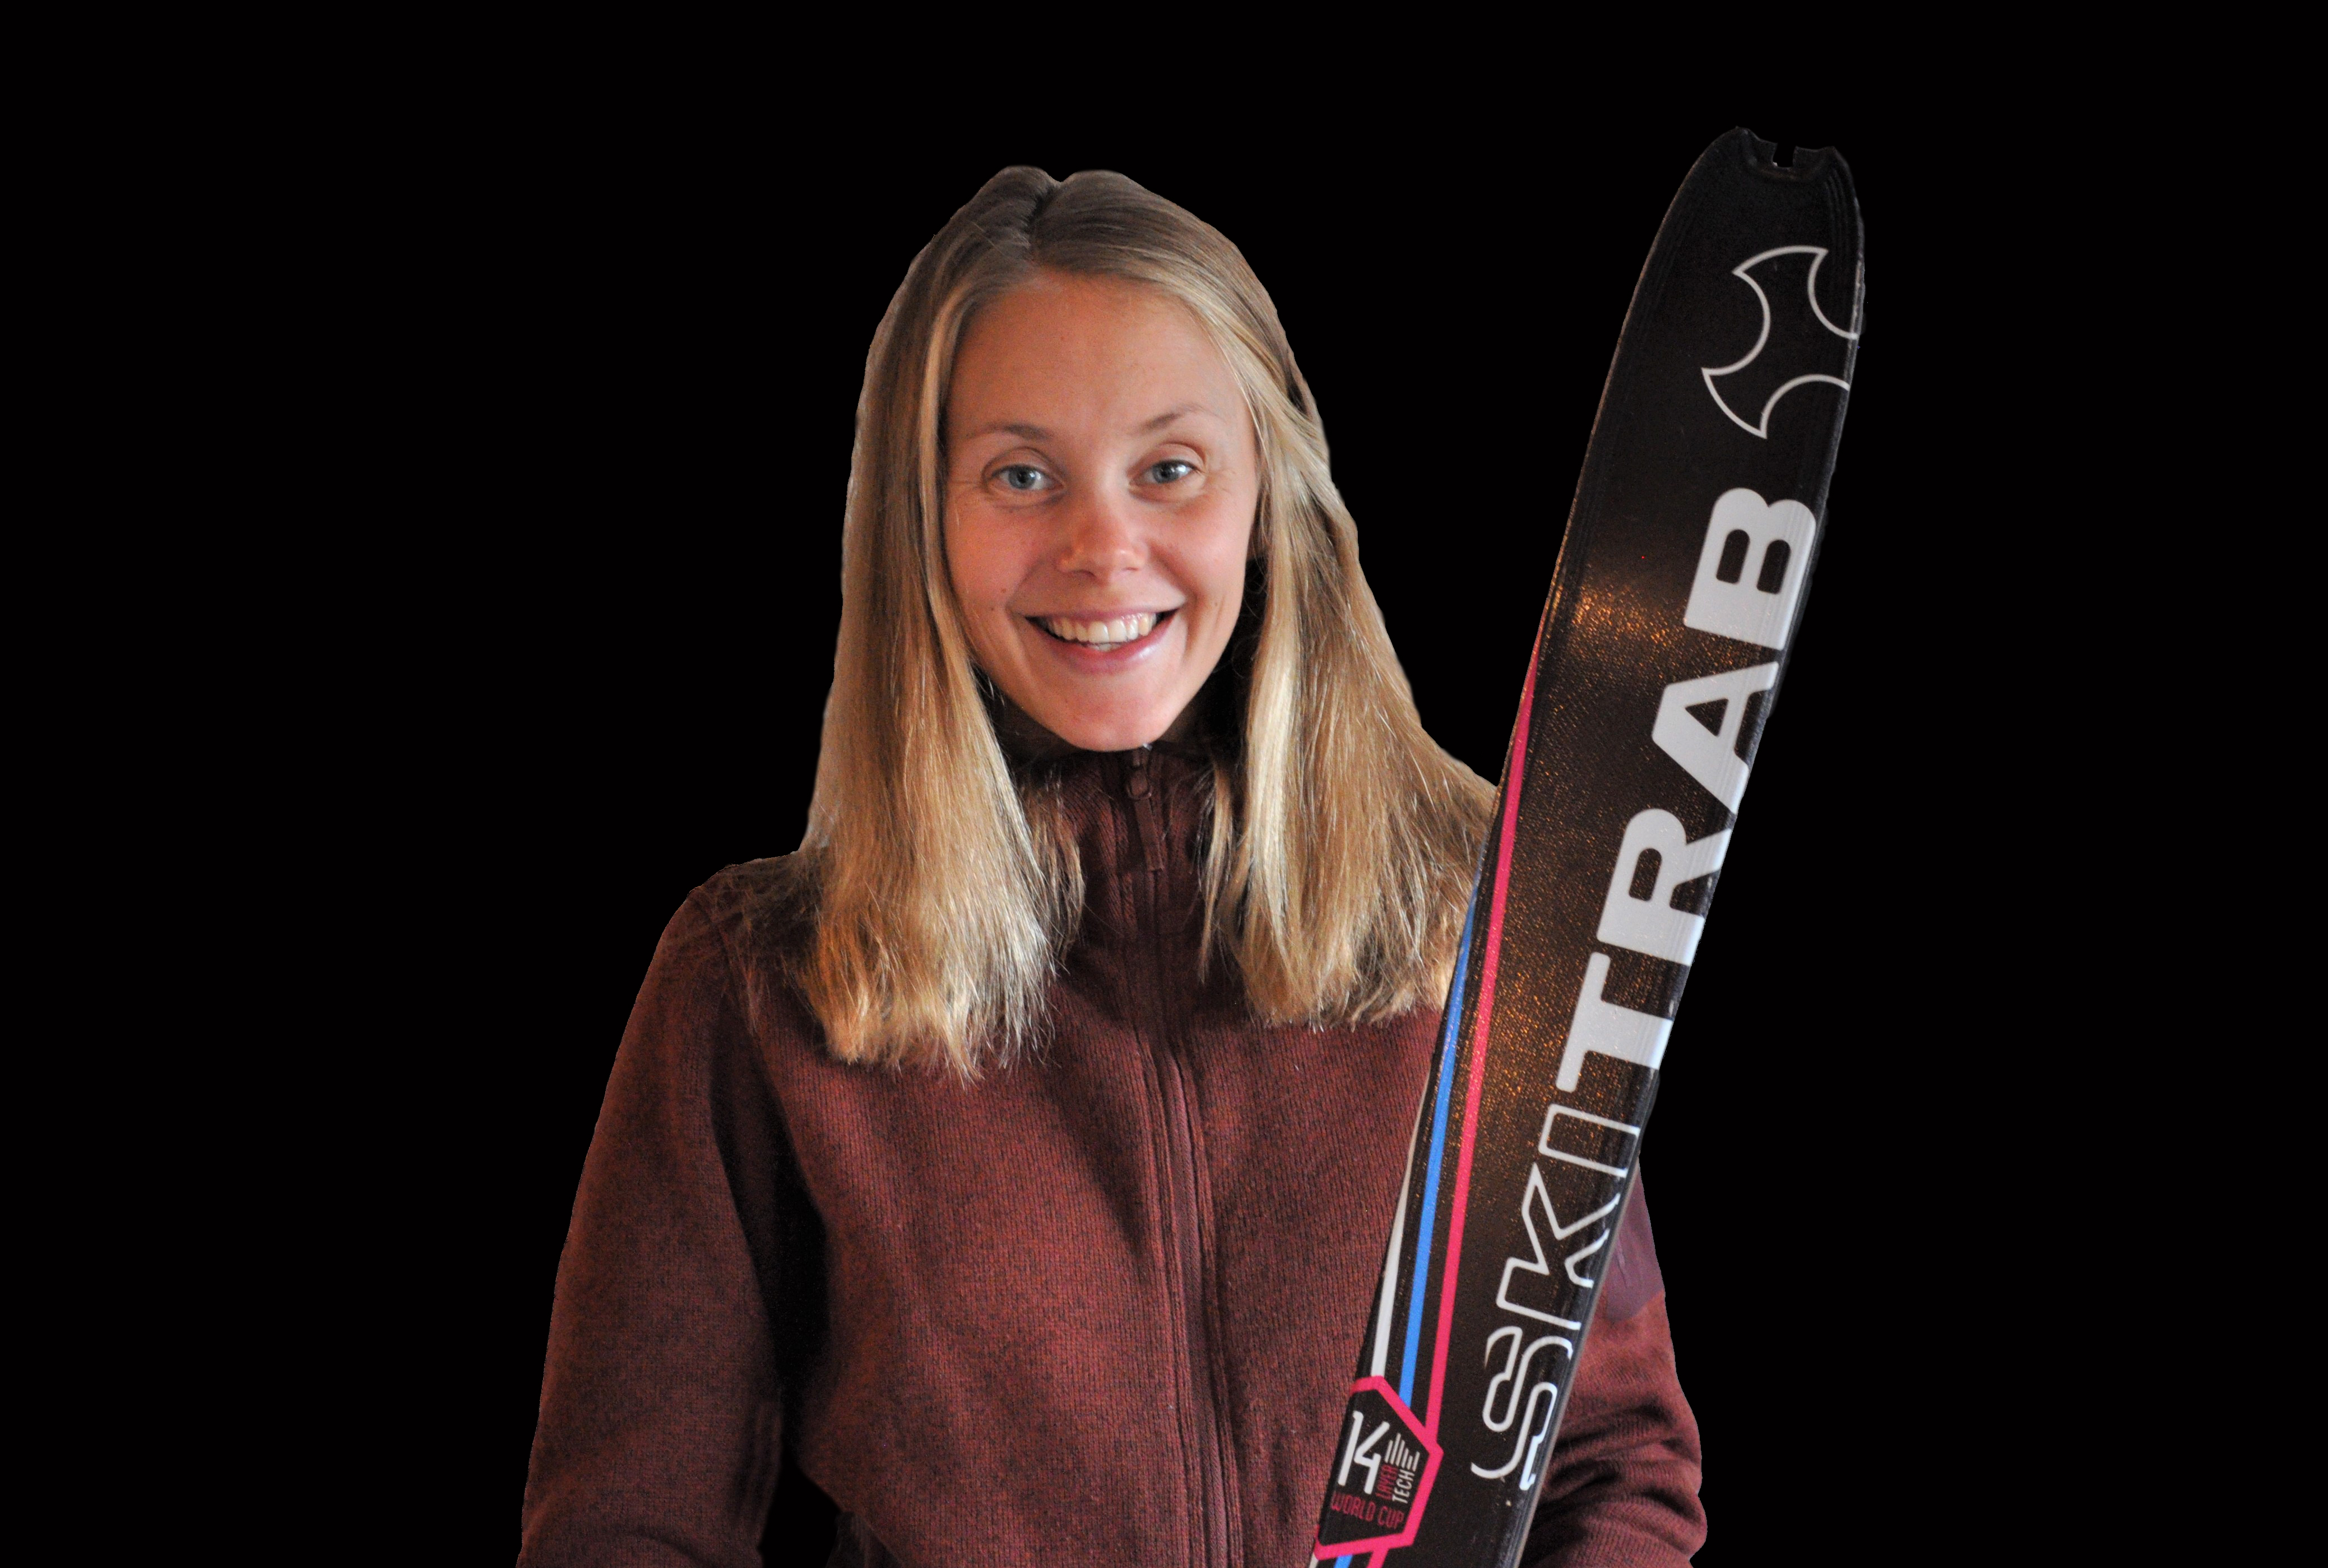 Johanna Åström